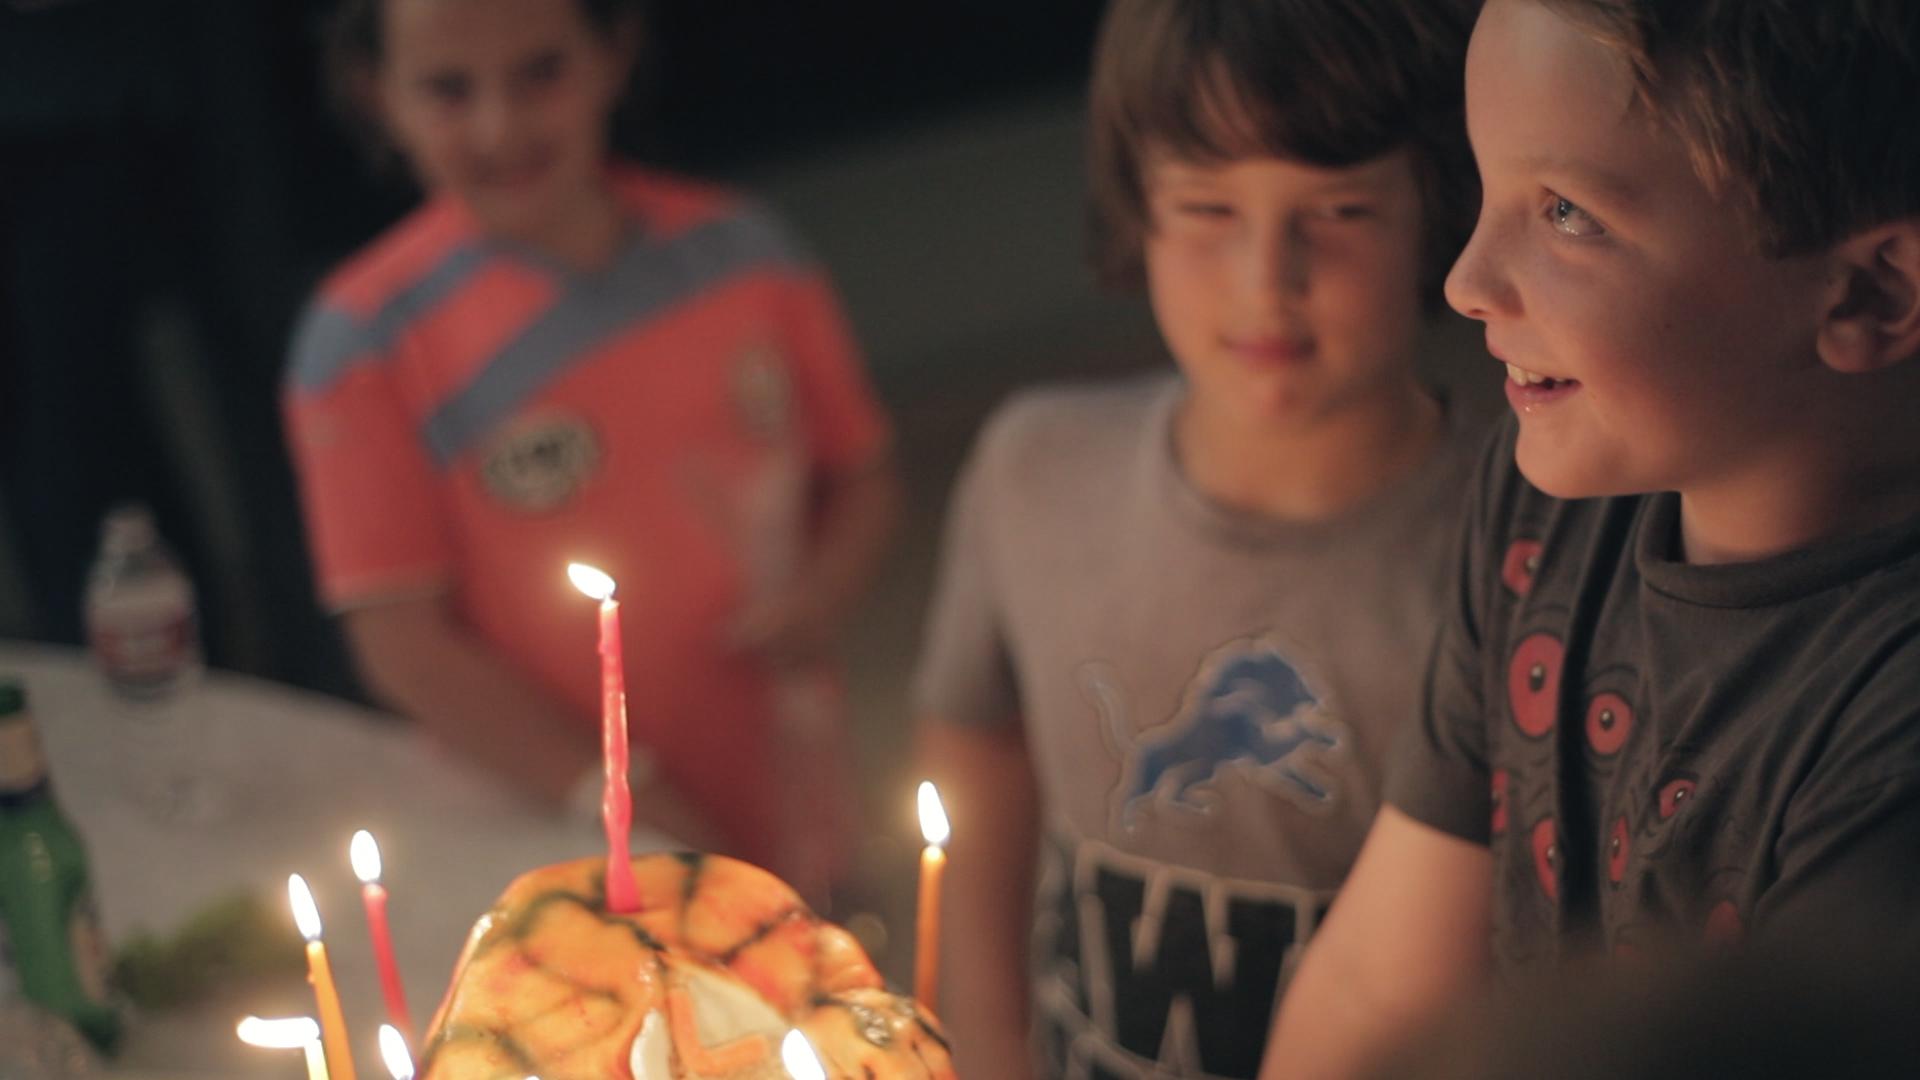 woodwalk-communigift-los angeles-birthday-party-boy-cake-candle